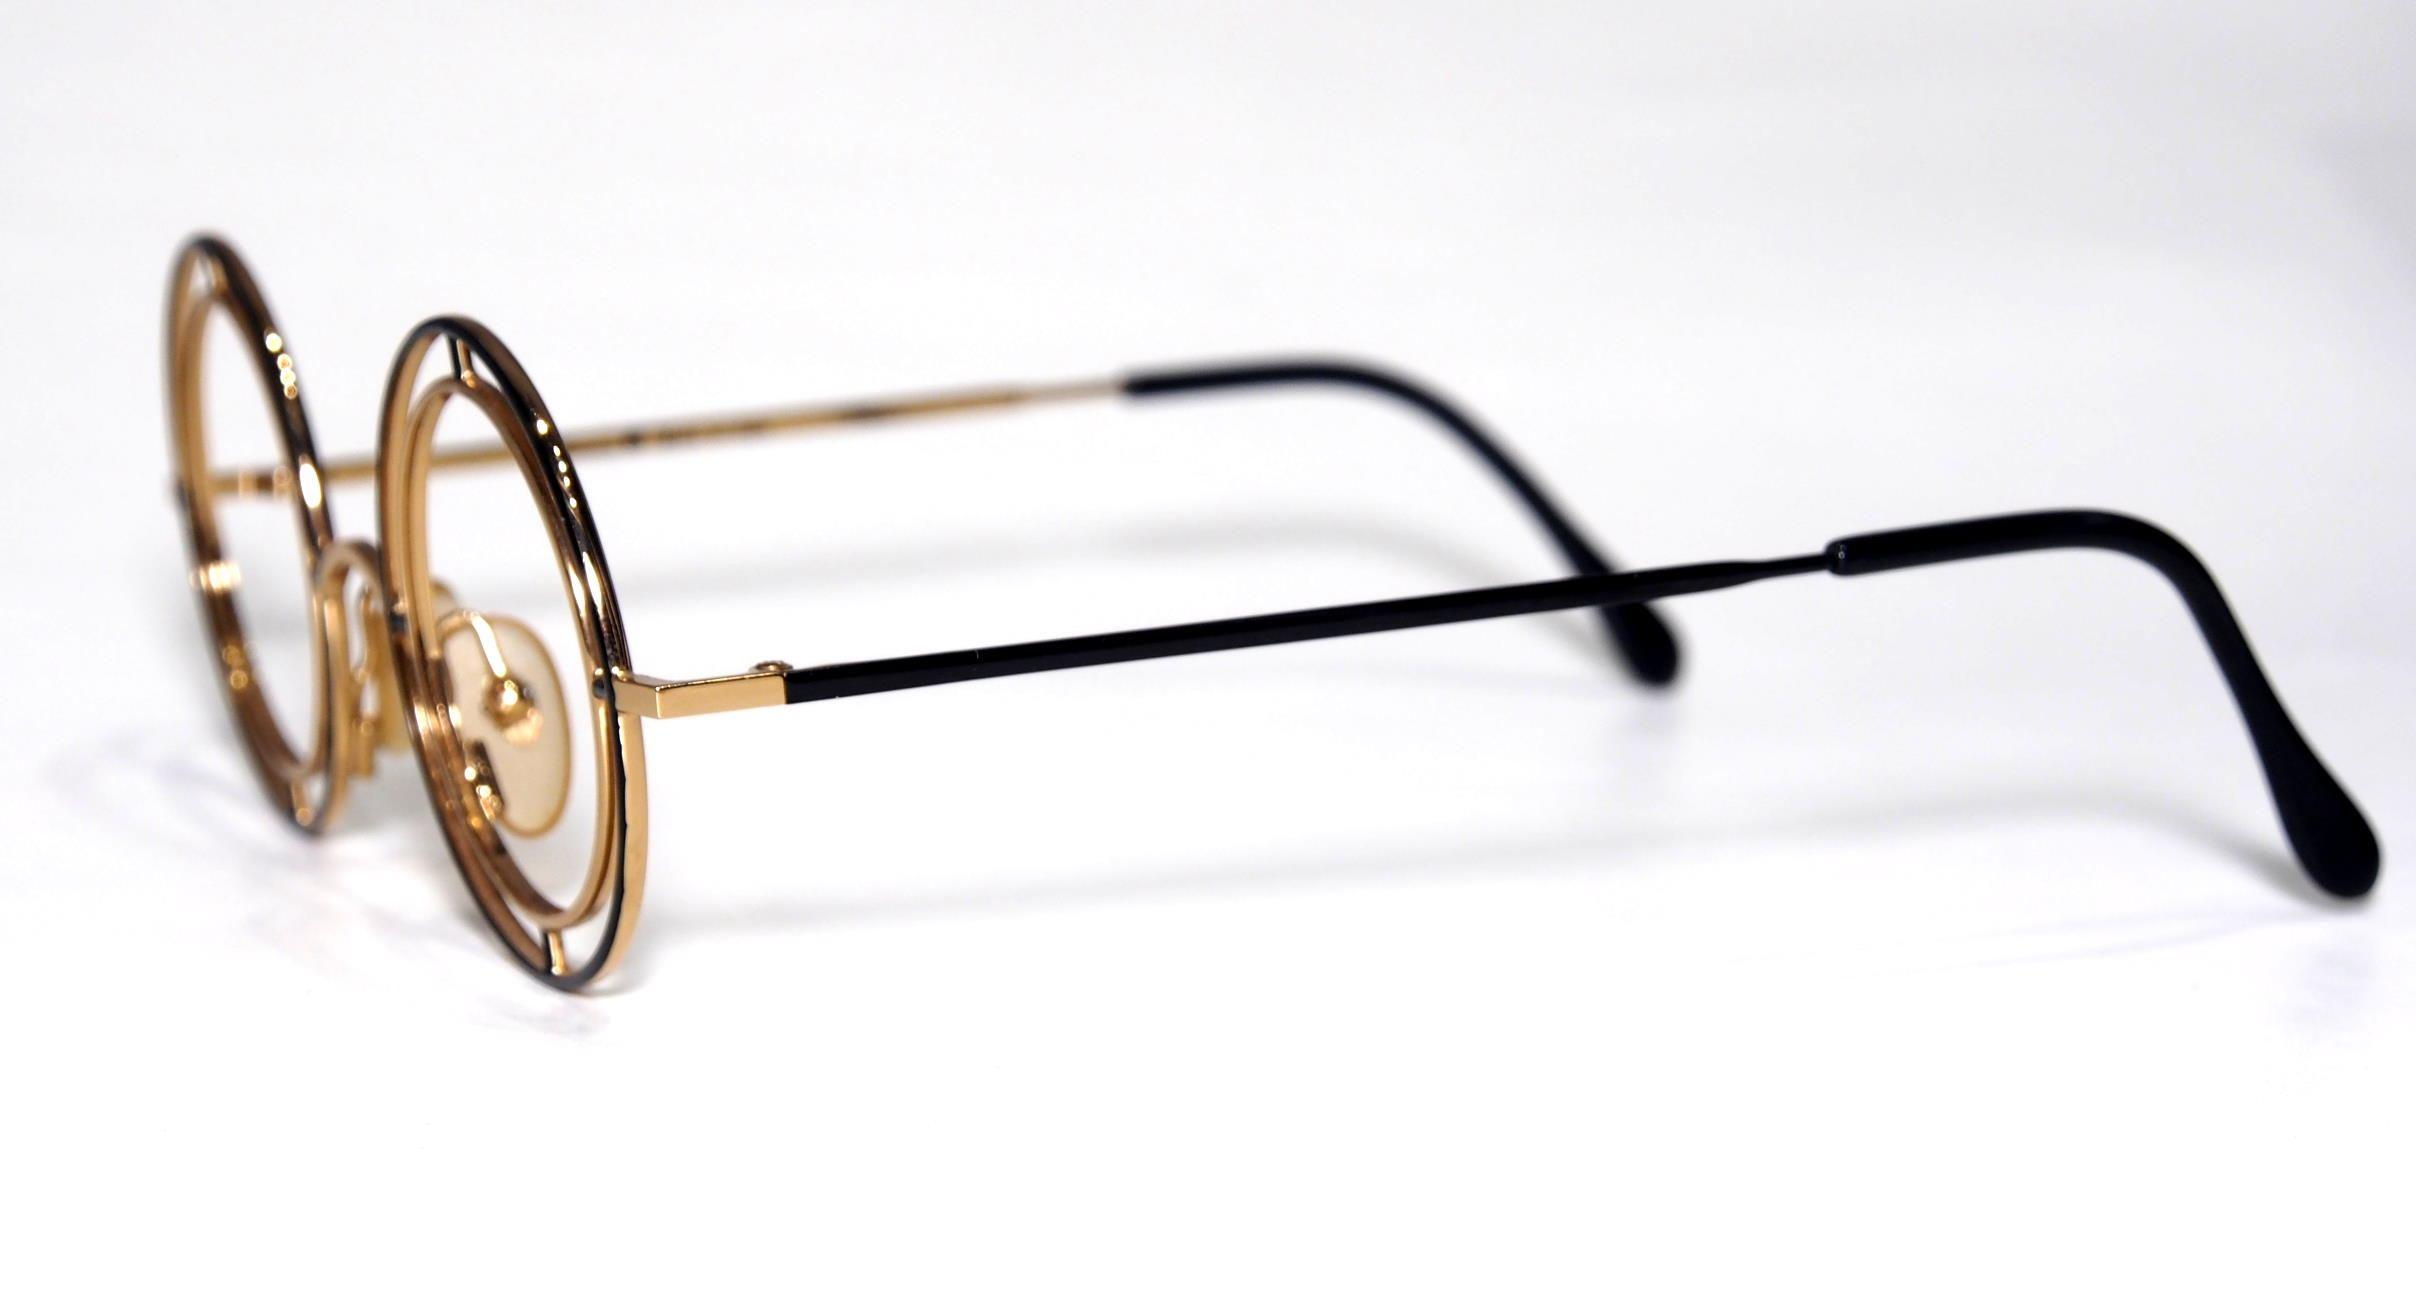 Casanova eyewear,Brille MTC-2 Made in Italy